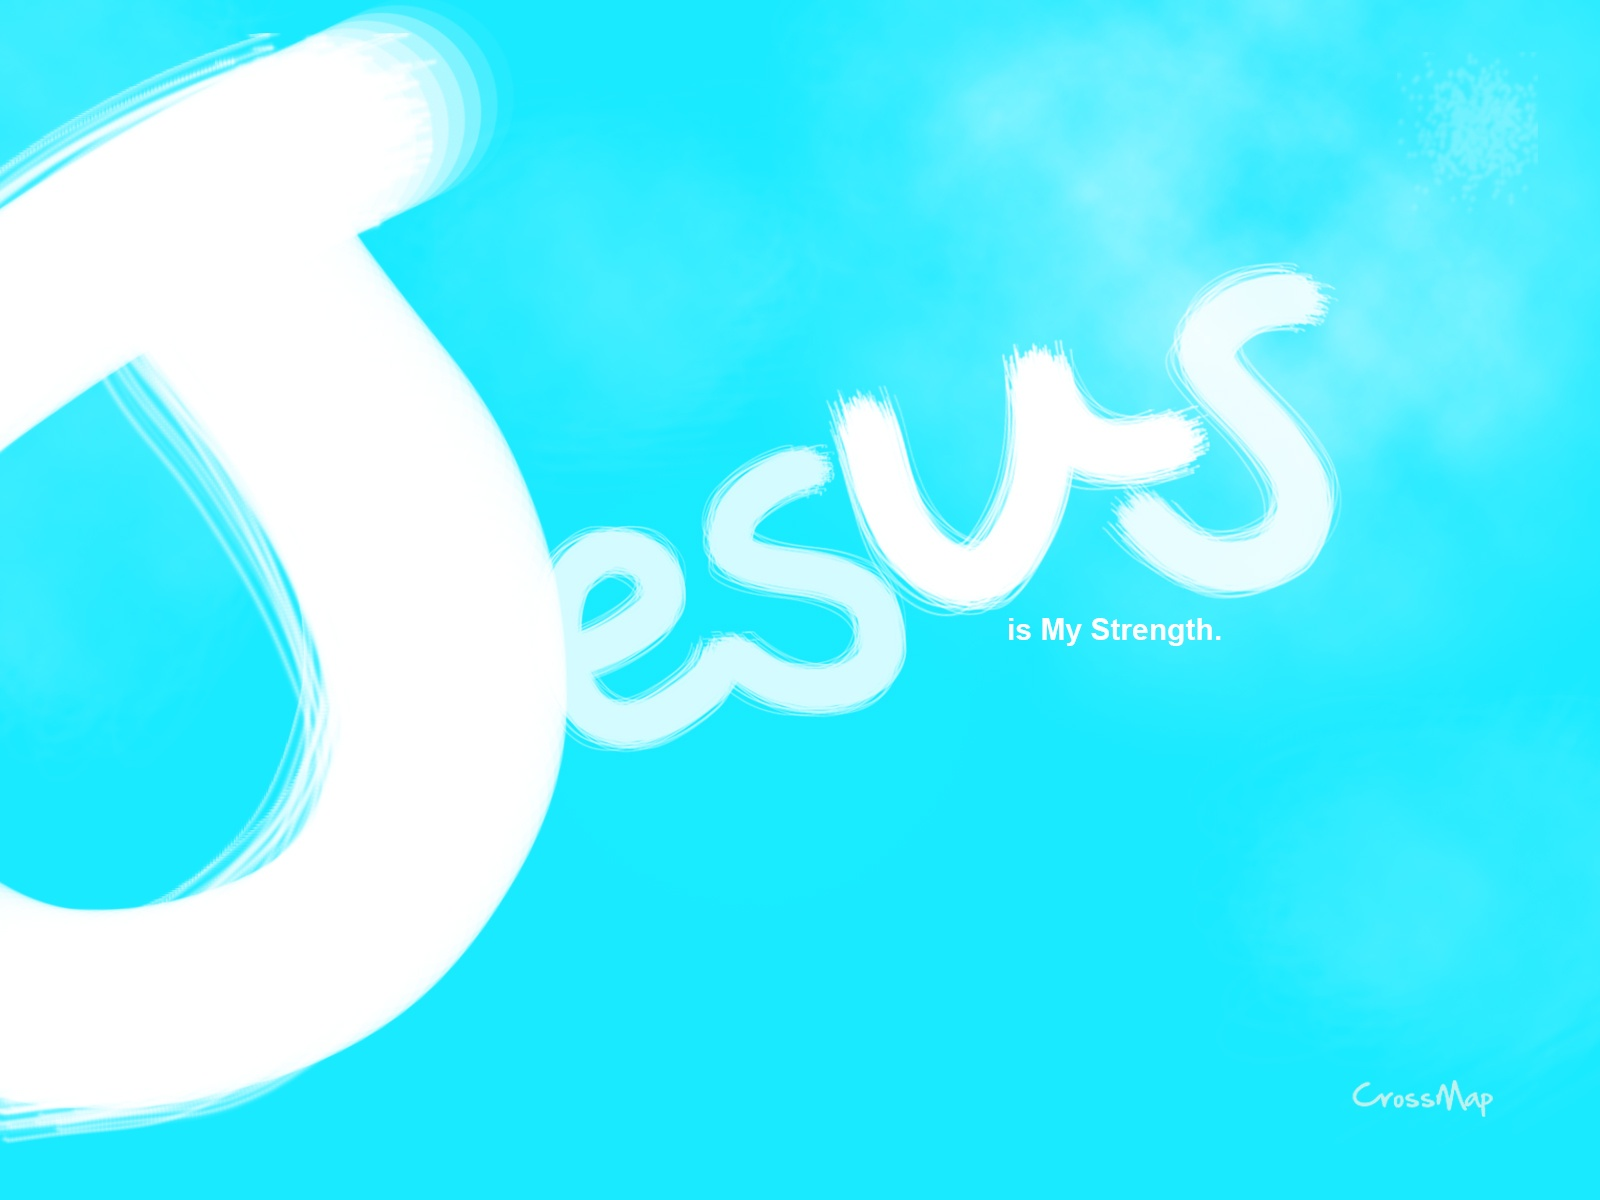 Jesus is my strength Crossmap 1600x1200